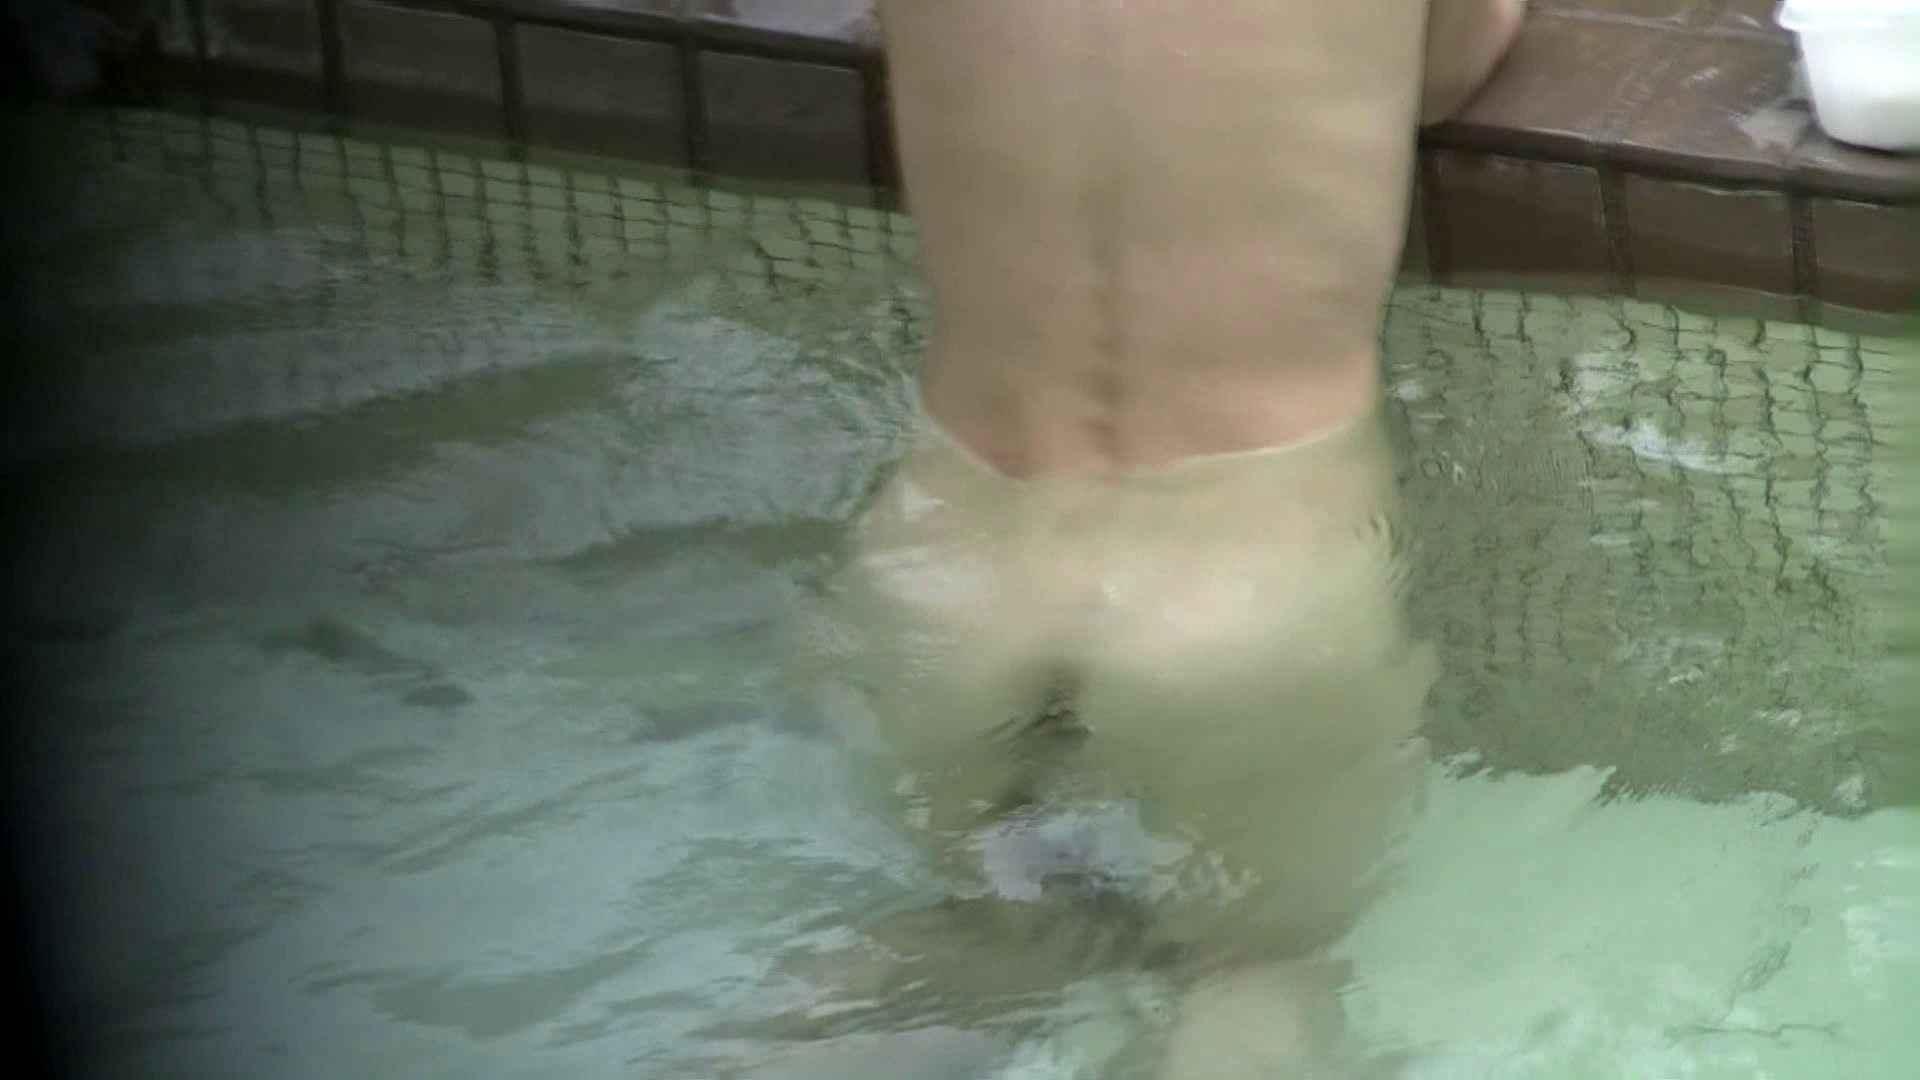 Aquaな露天風呂Vol.653 盗撮師作品  71pic 45